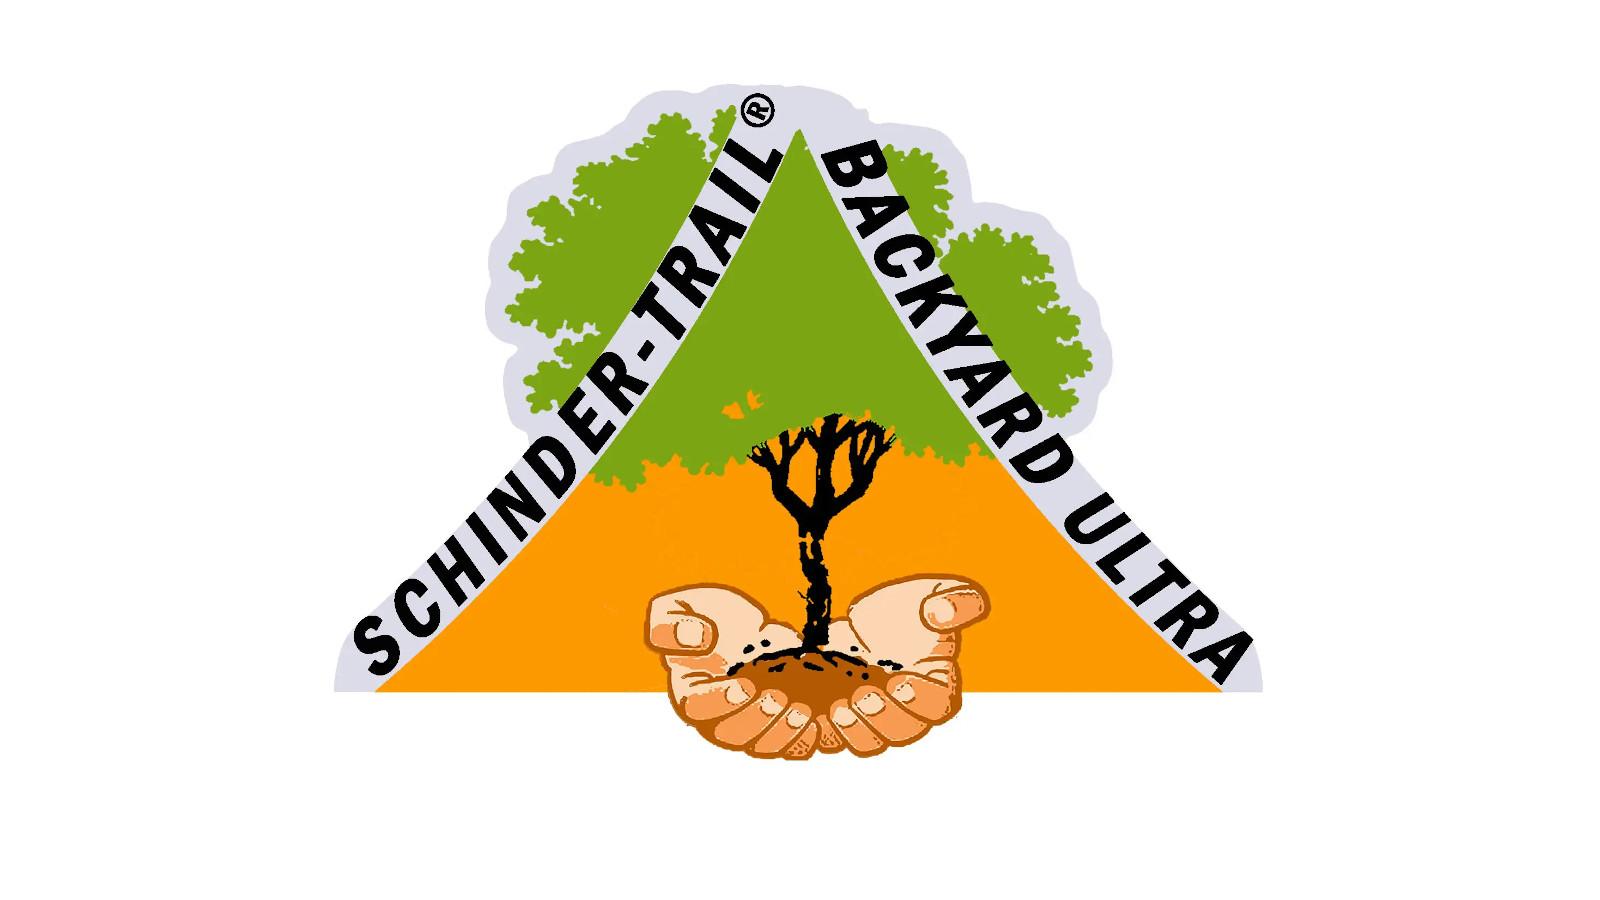 schinder-trail-backyard-ultra